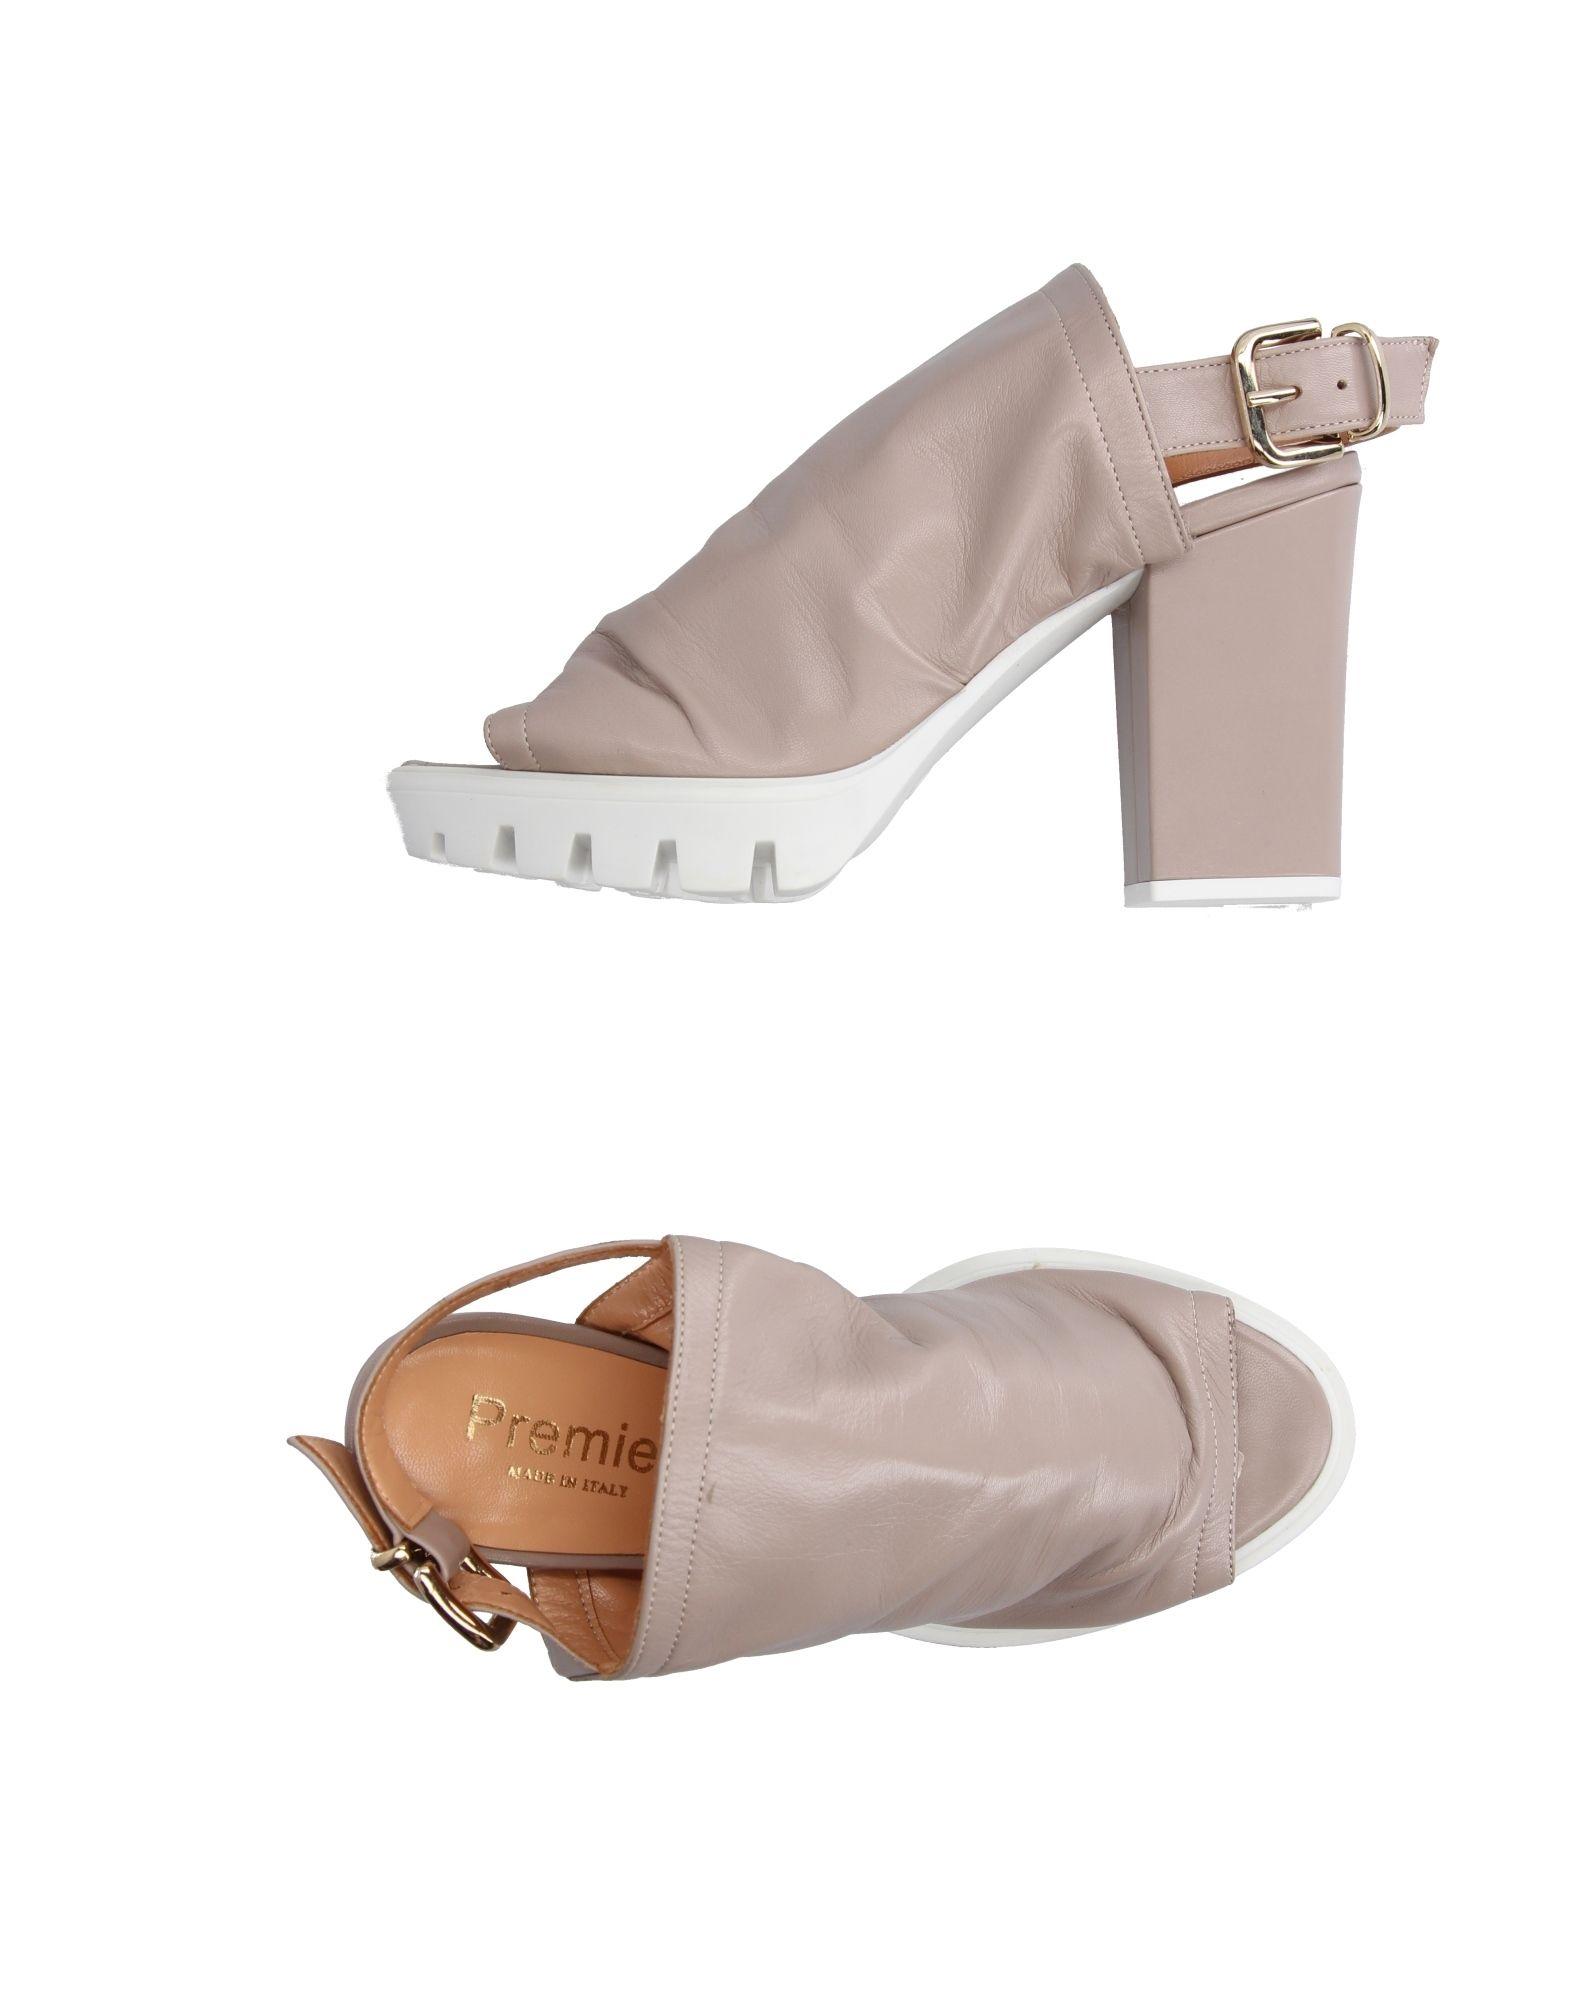 Premier Sandalen Damen  11217067ND Gute Qualität beliebte Schuhe